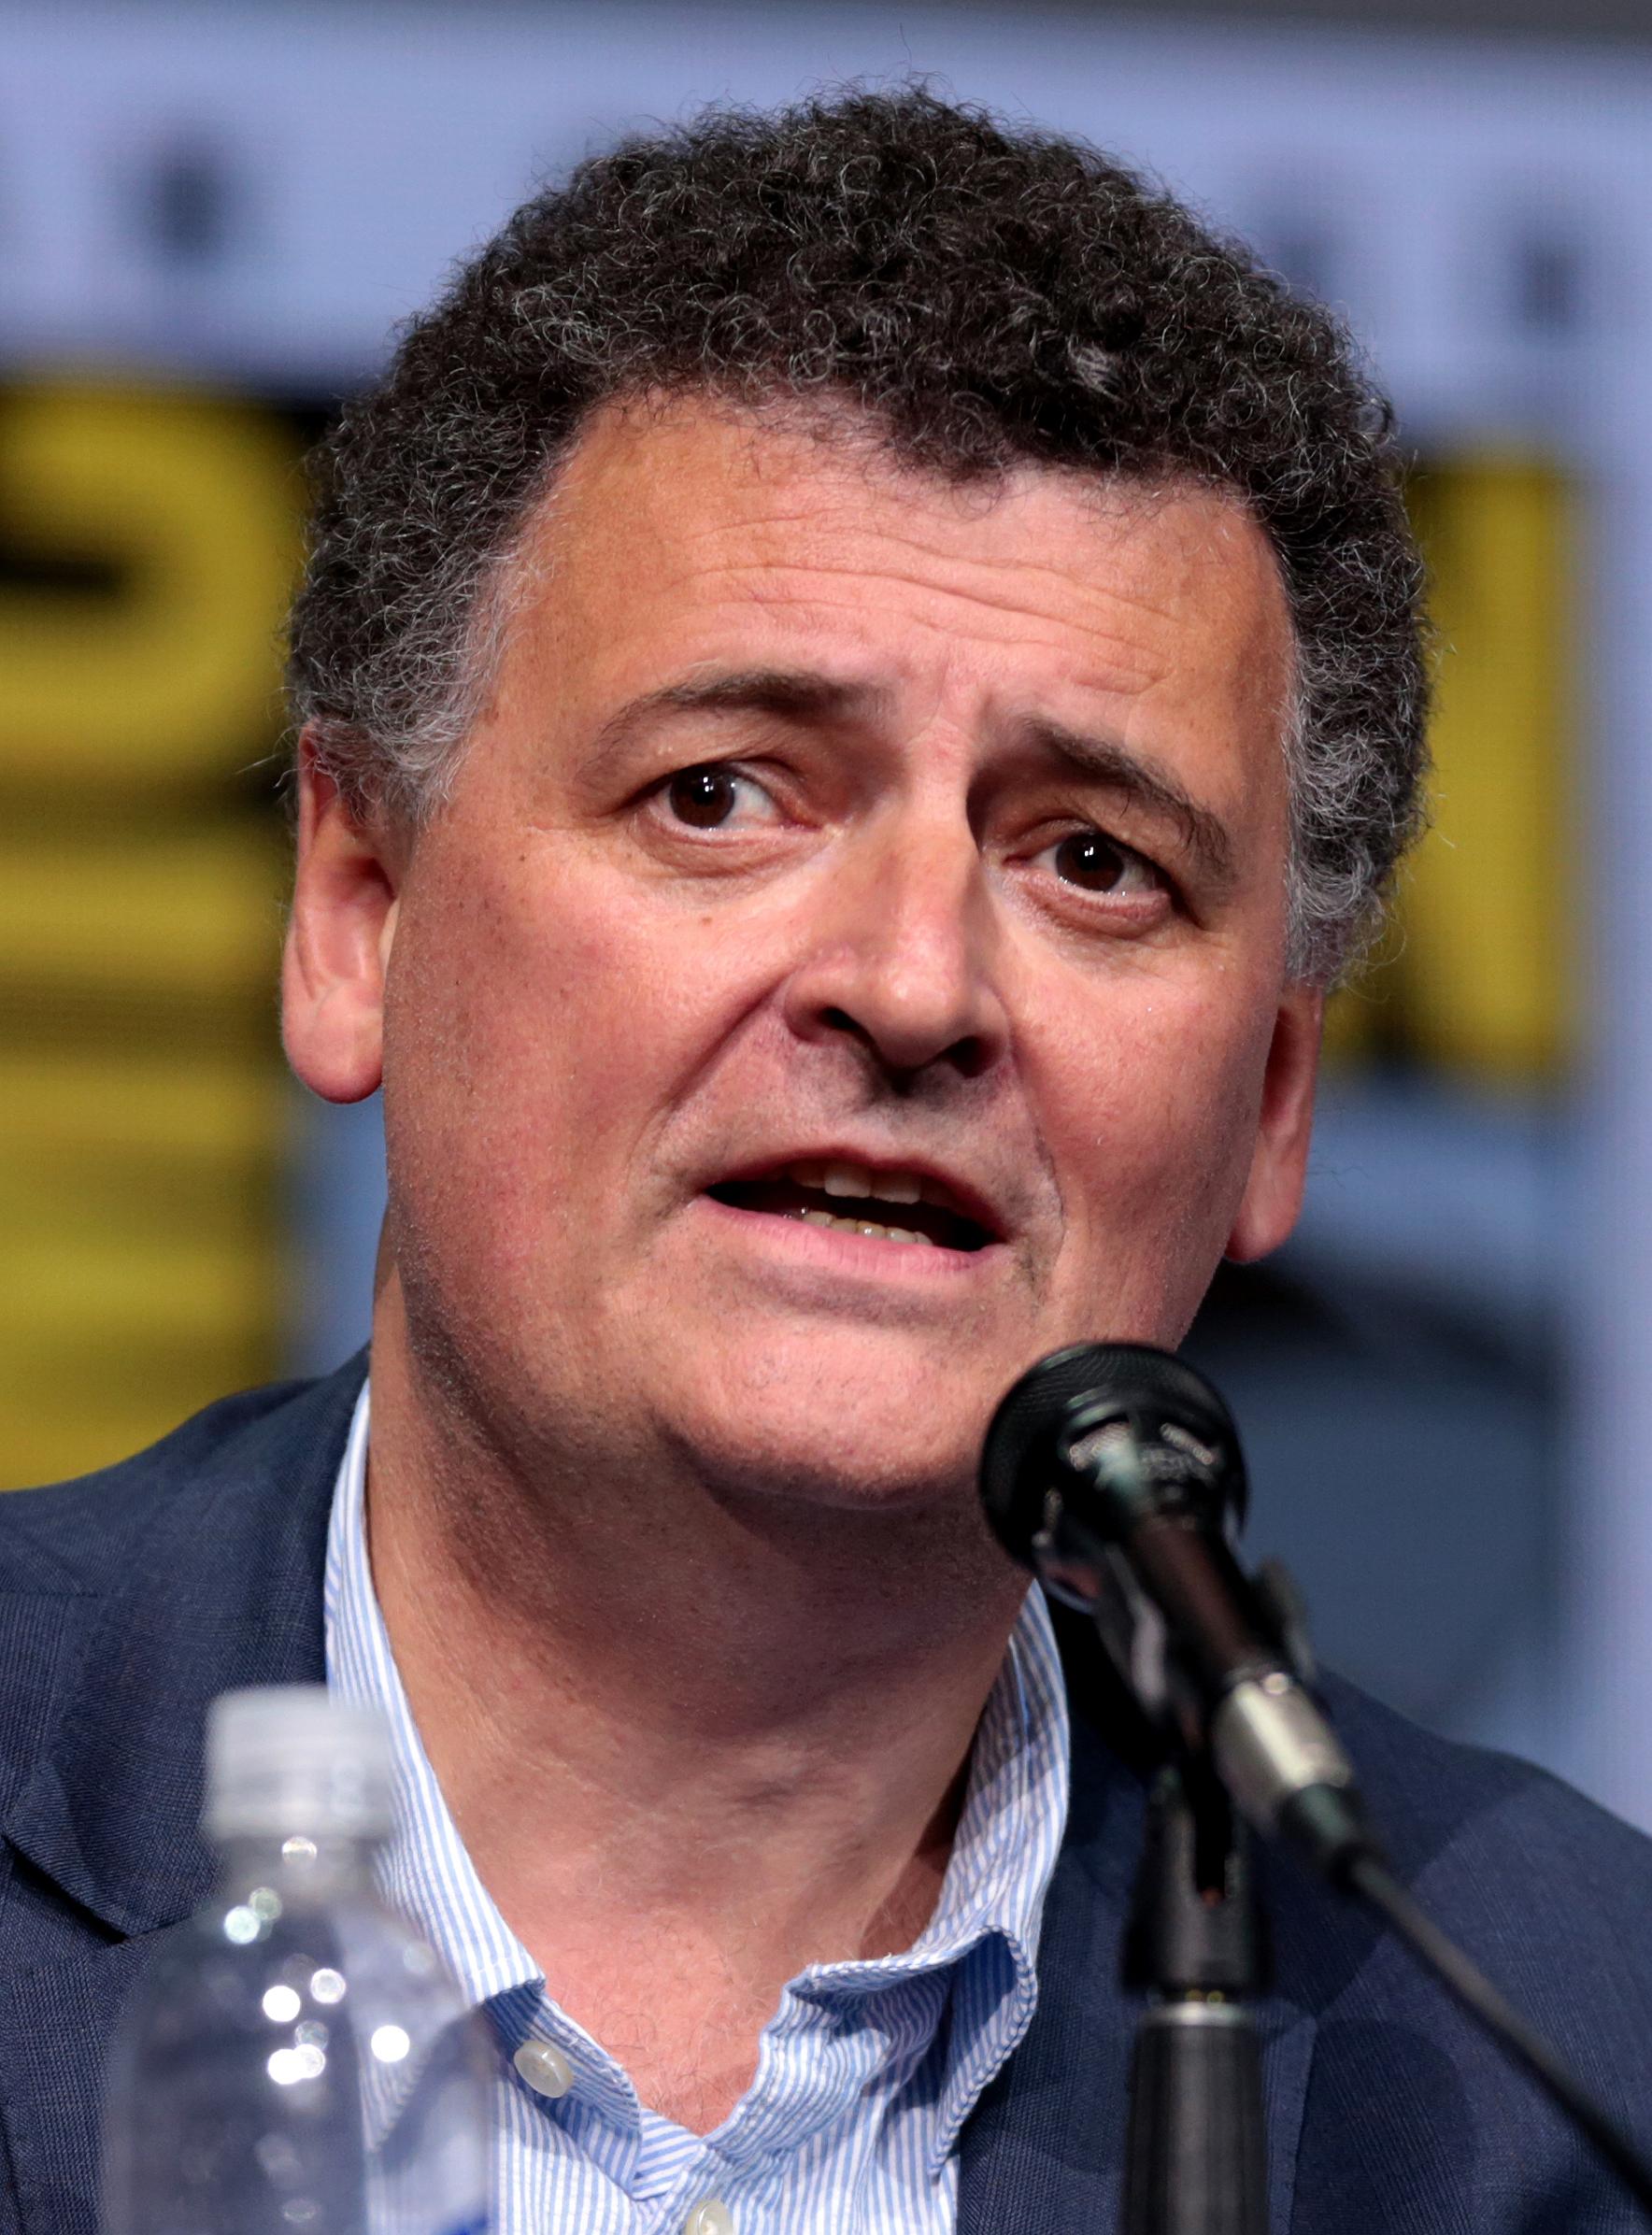 Moffat in 2017